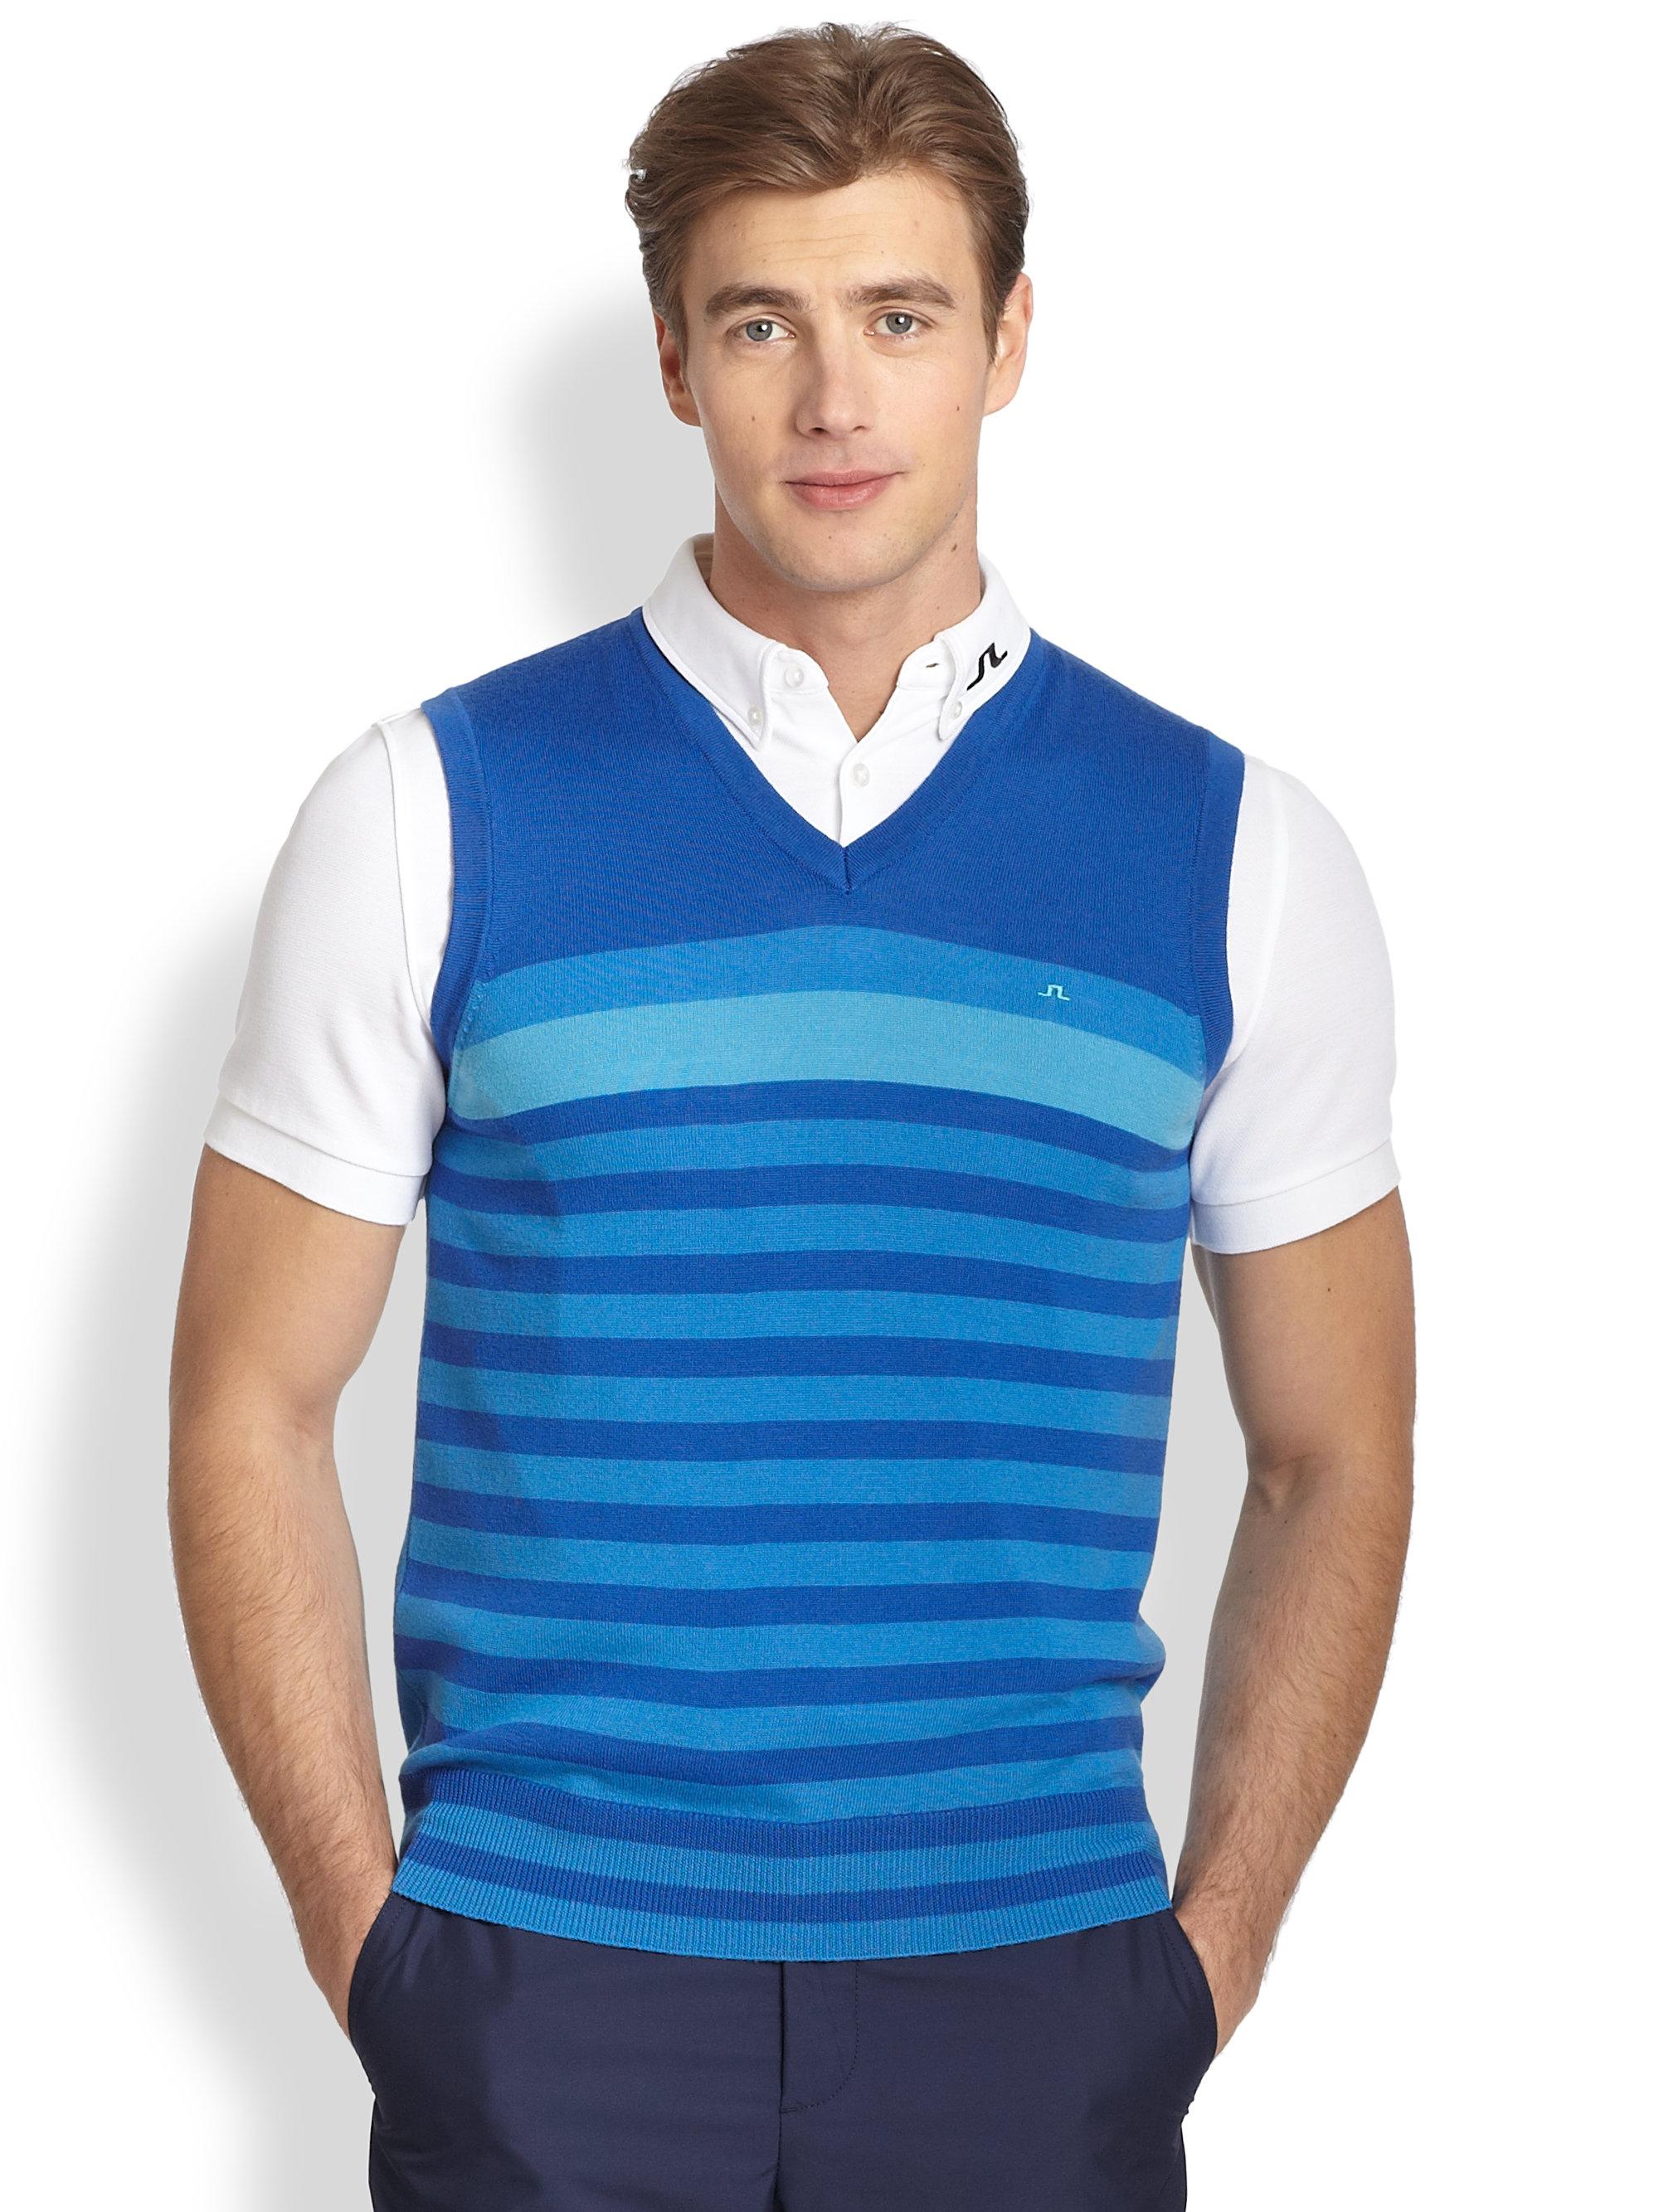 J.lindeberg Gunder Striped Merino Wool Vest in Blue for Men | Lyst